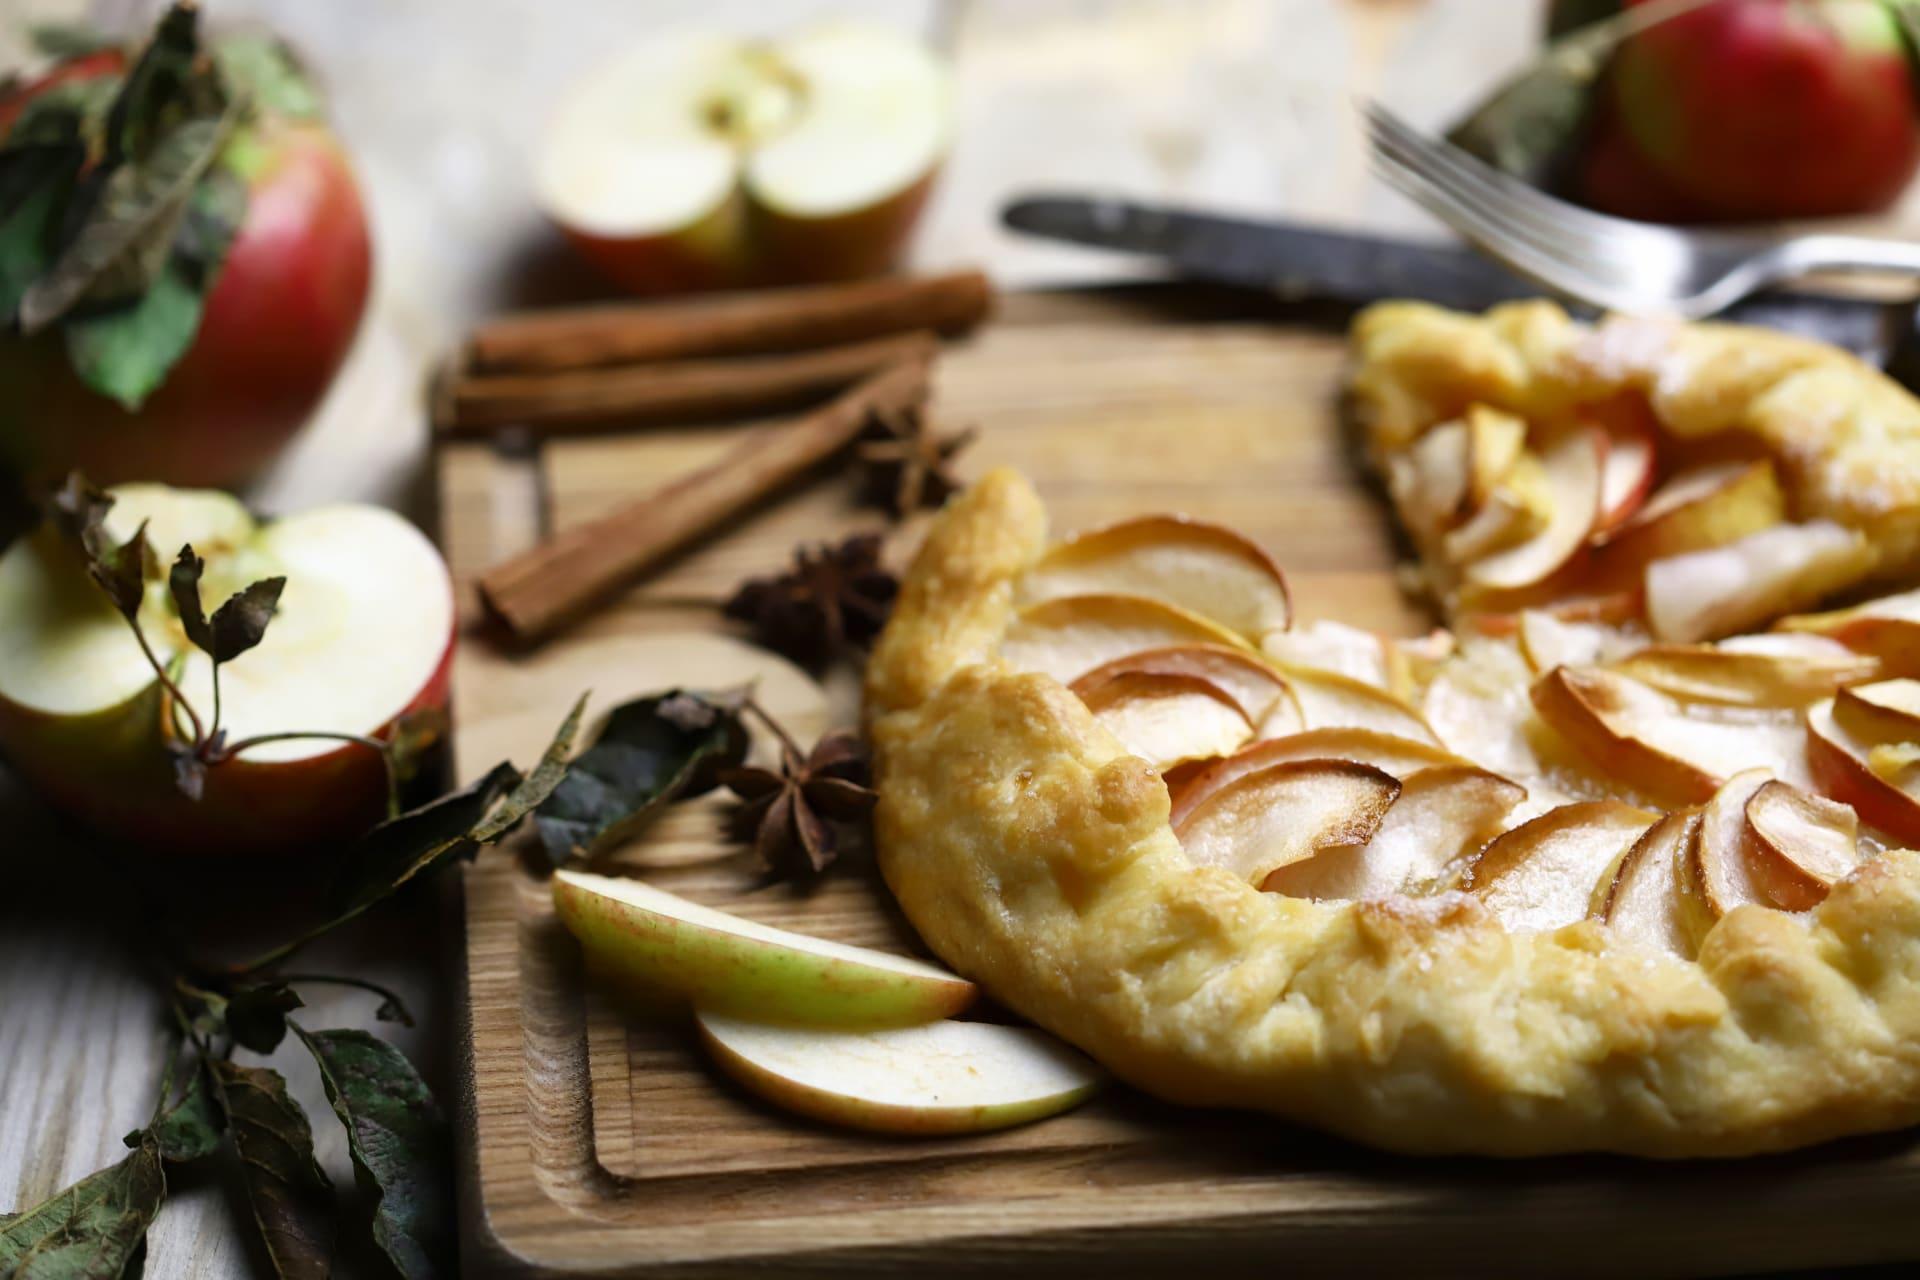 Oregon - Making Apple Cider While Baking an Apple, Pear and Cinnamon Crostata